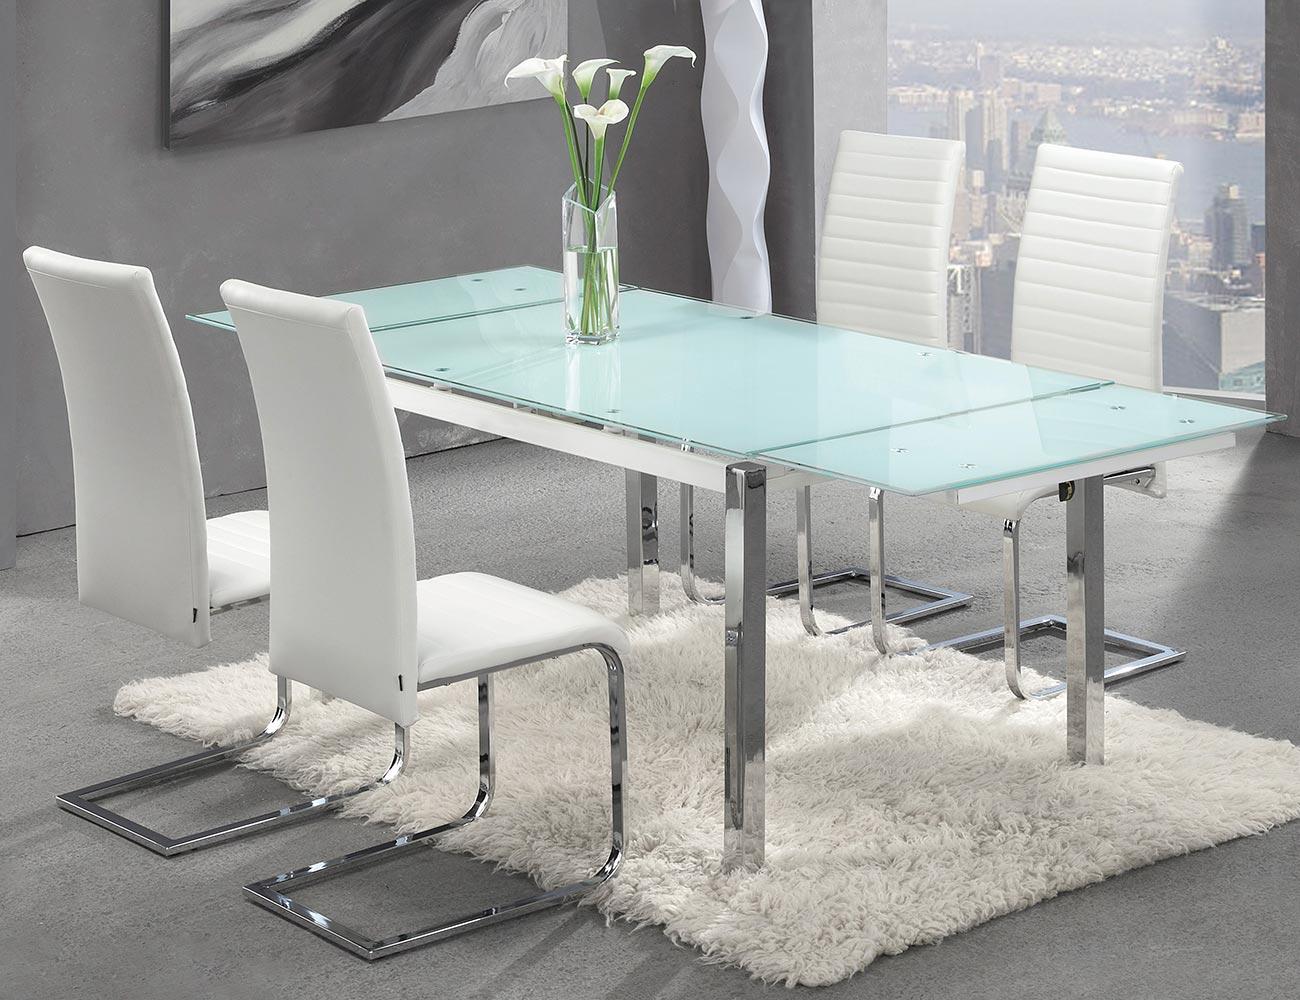 Genial mesas de comedor blancas extensibles fotos mesas - Mesa de comedor cristal ...